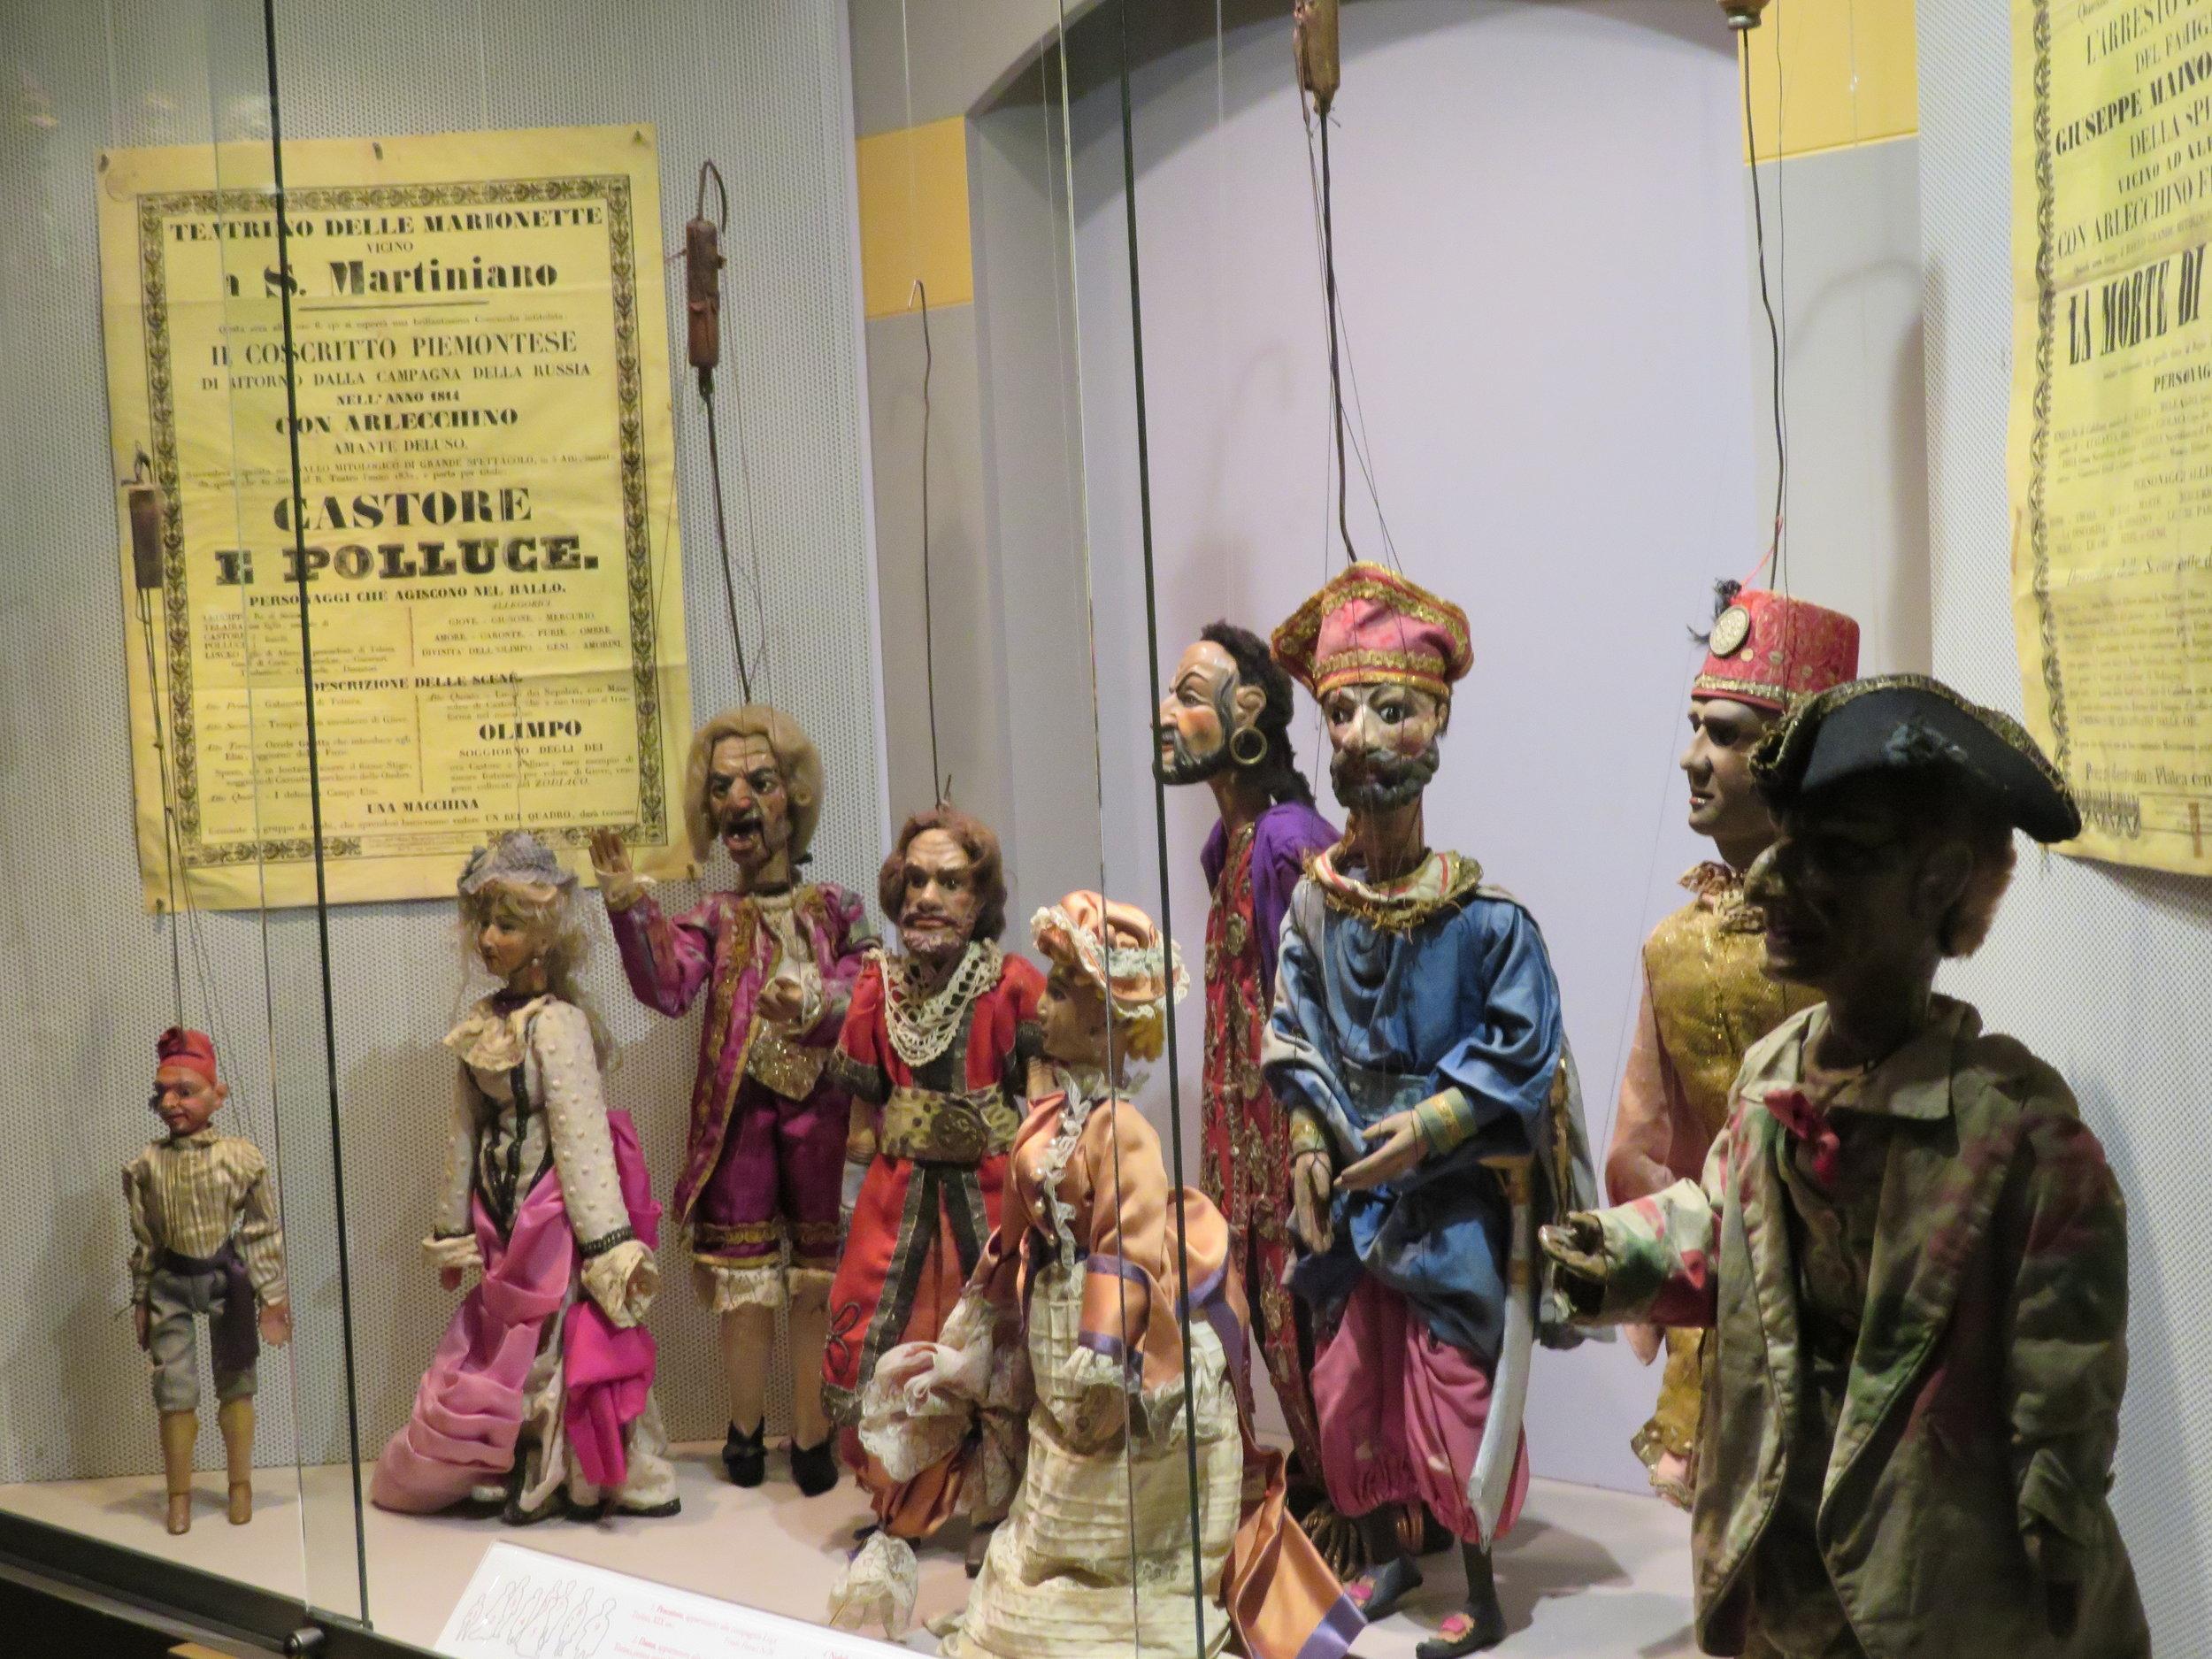 Parma_puppet museum1.JPG